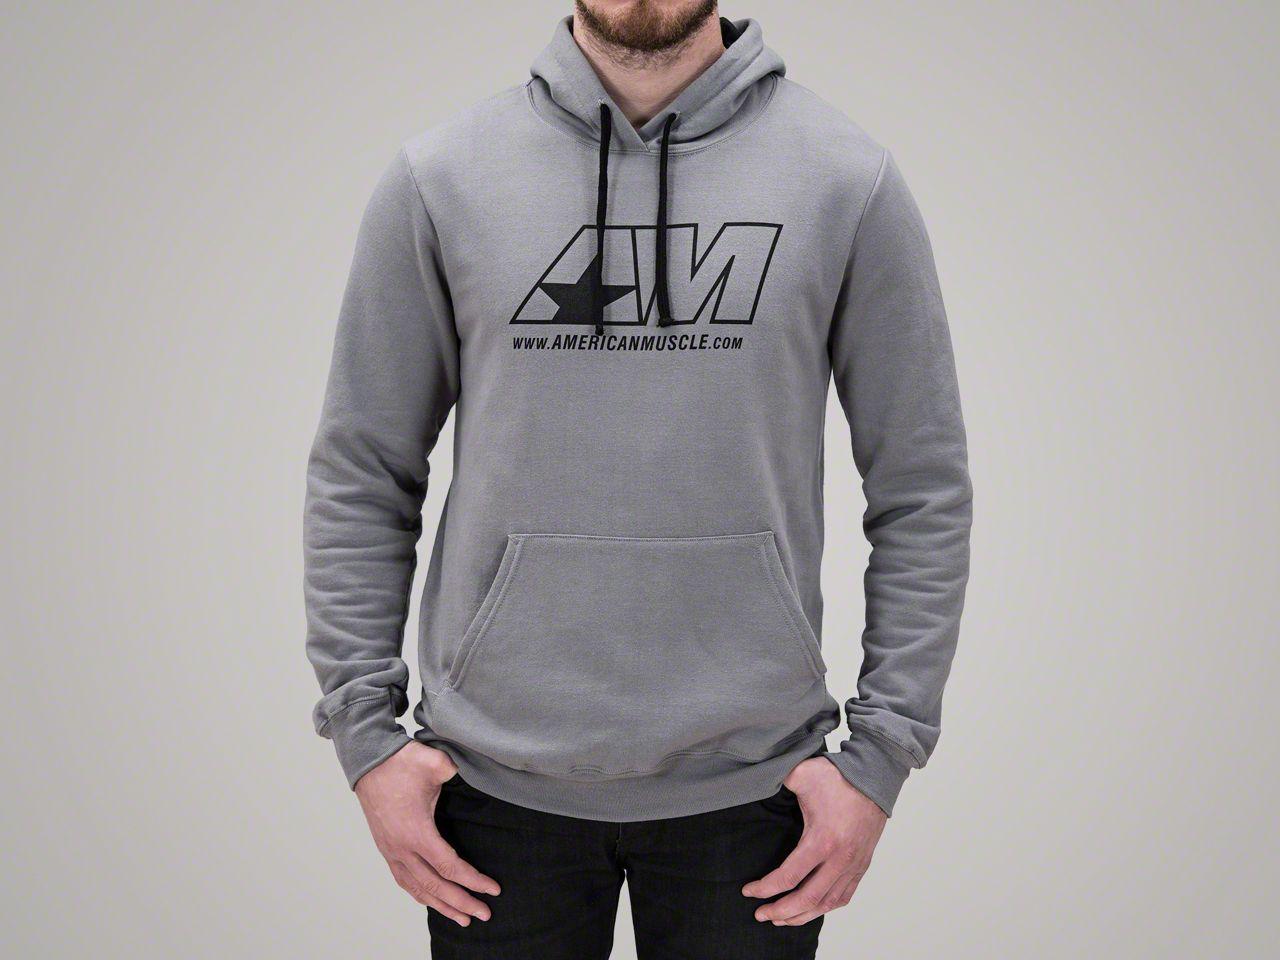 AmericanMuscle Gray Hoodie - XL